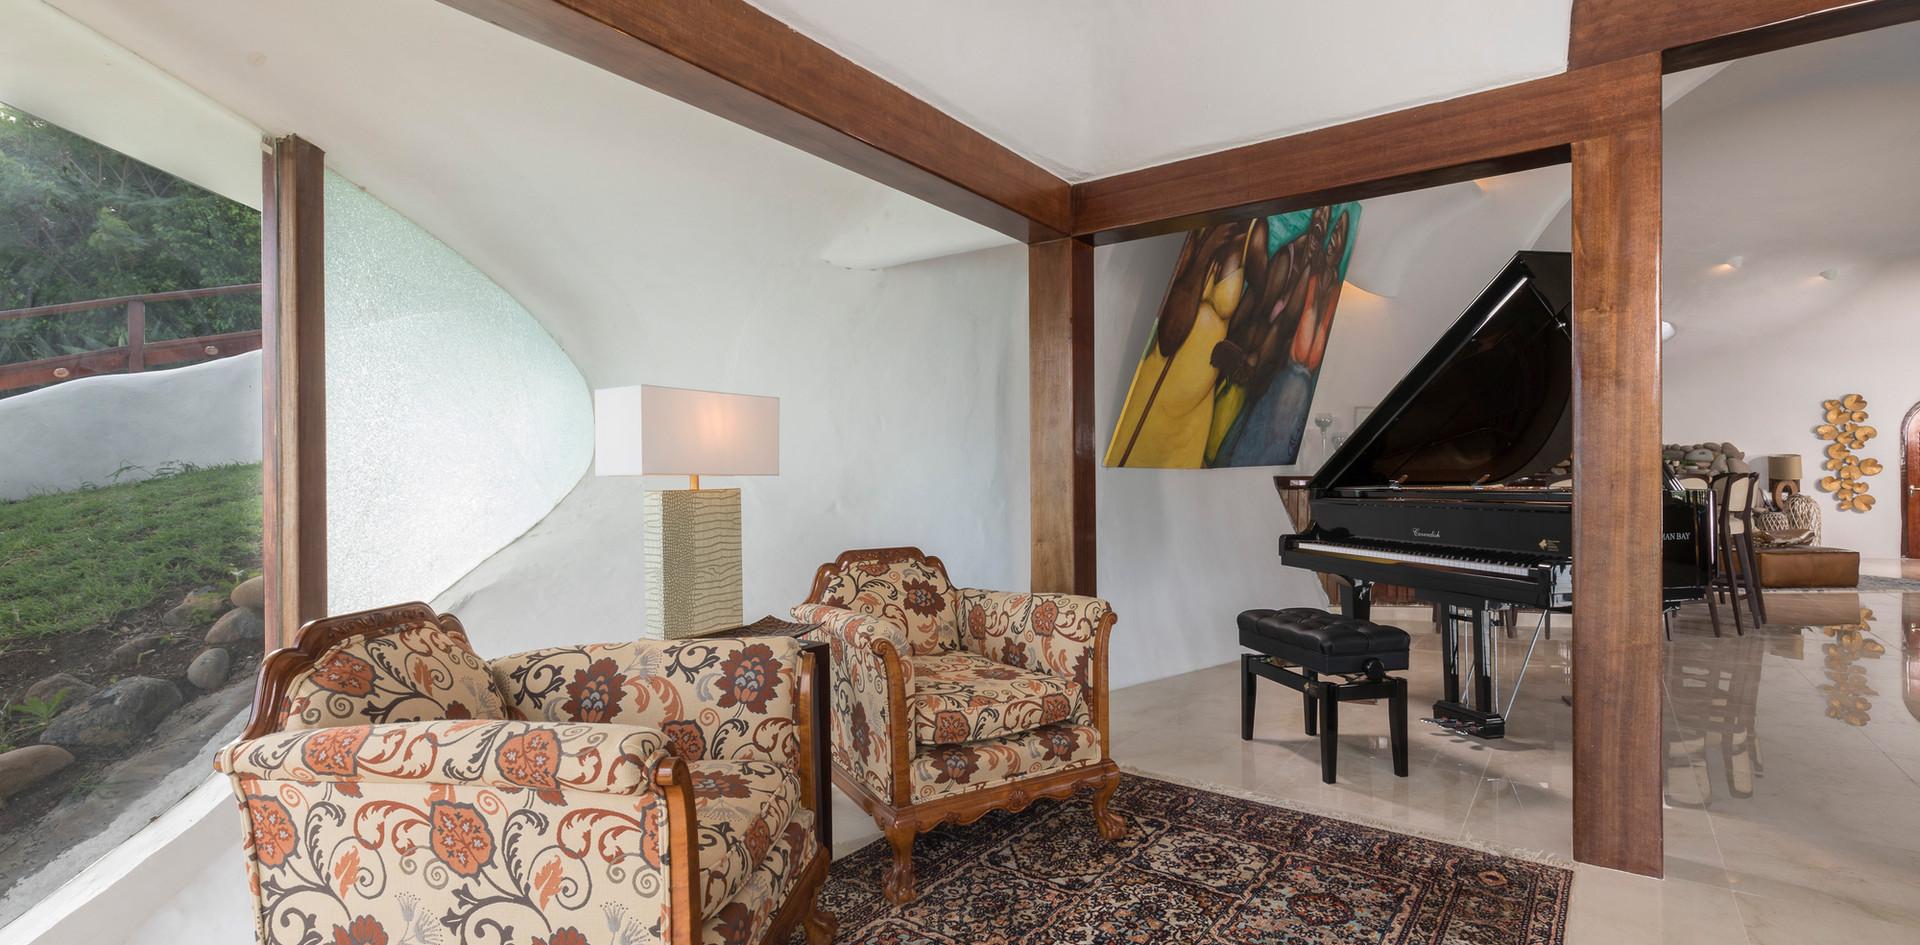 A quiet corner in the Great Room